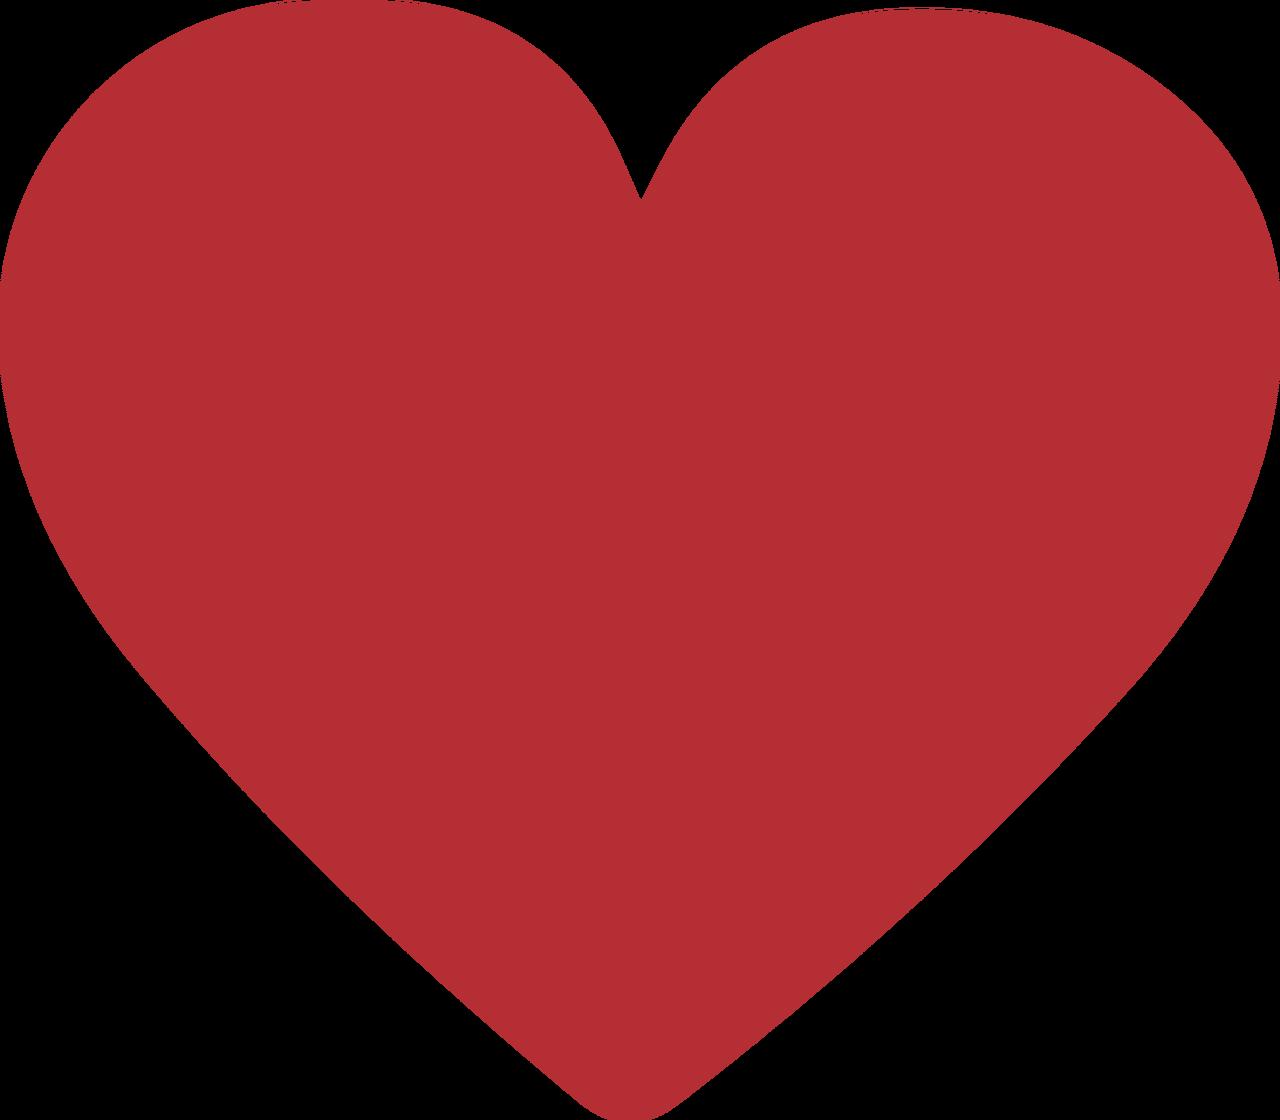 Heart #2 SVG Cut File